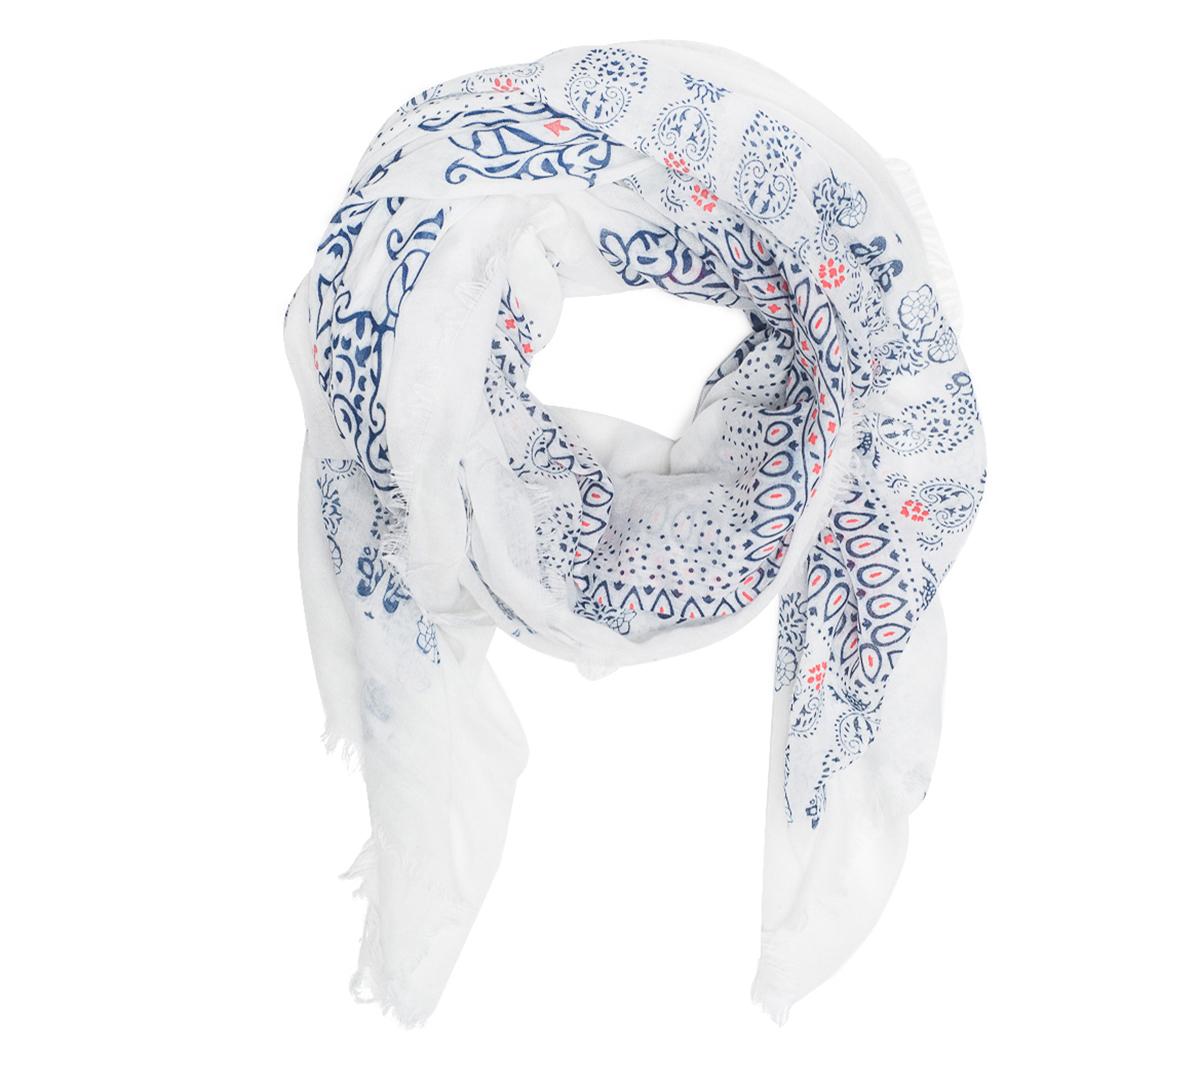 Eram Foulard Motif Bleu Blanc Et Mandala b76gfy